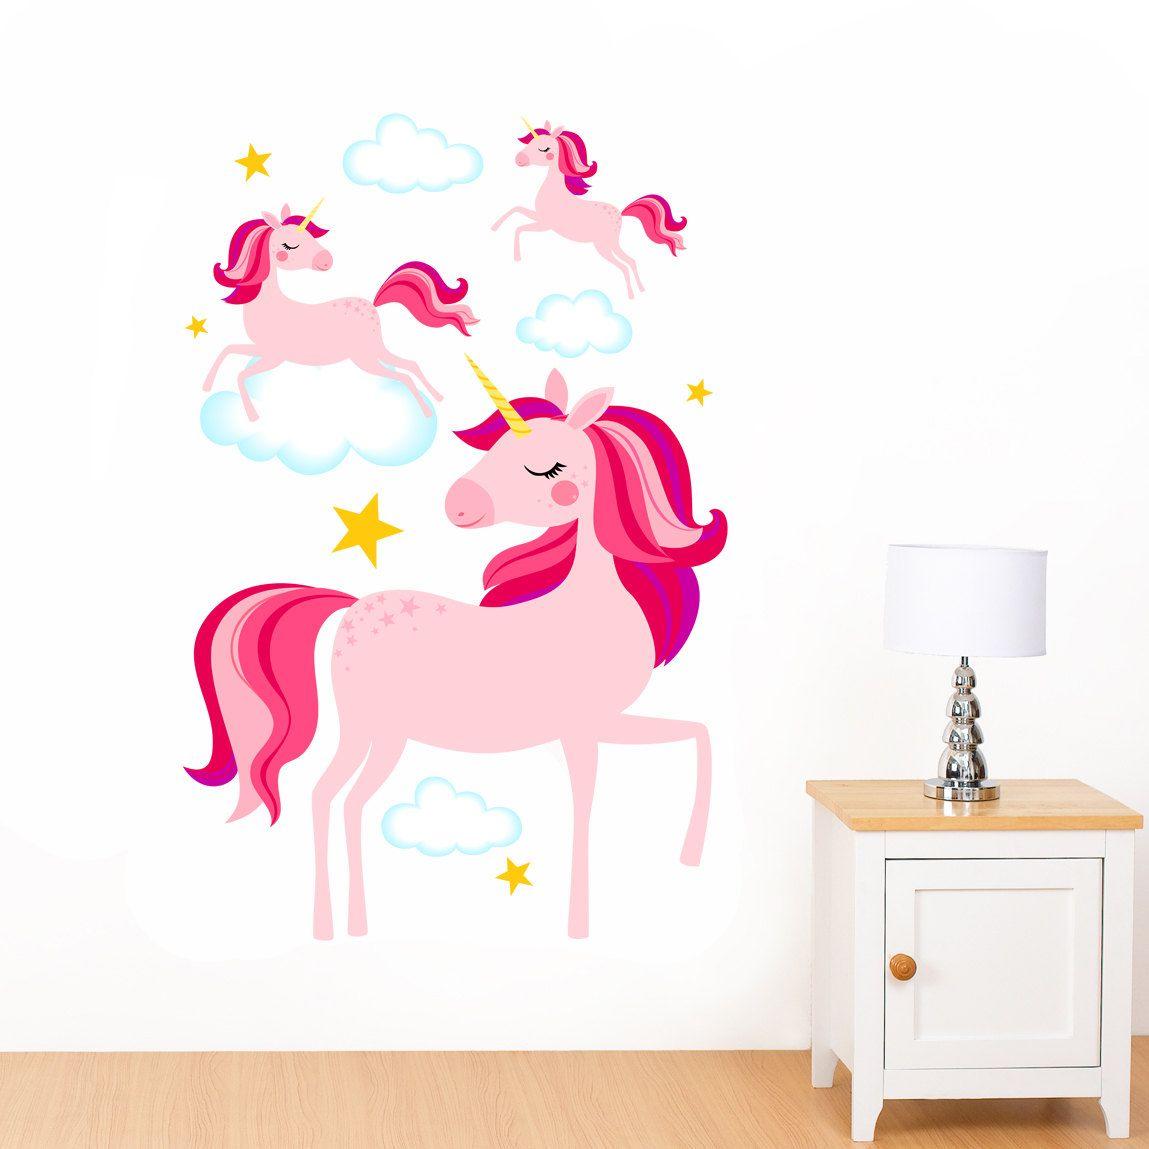 Dreamy Pink Unicorns Clouds Amp Stars Mural Wall Sticker